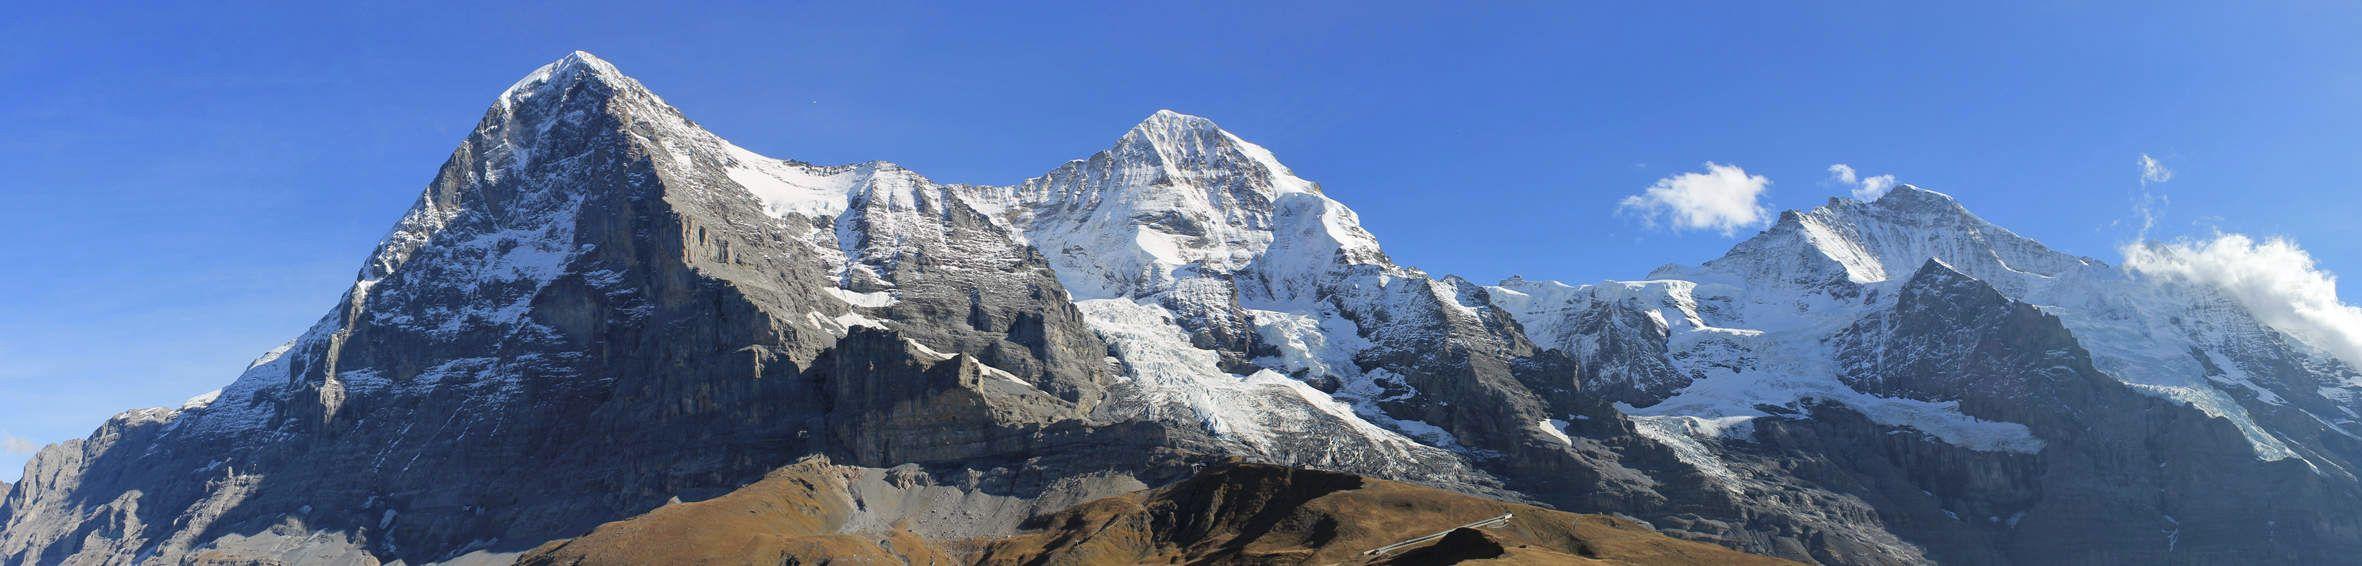 Eiger Mnch Jungfrau  Top of Europejpg